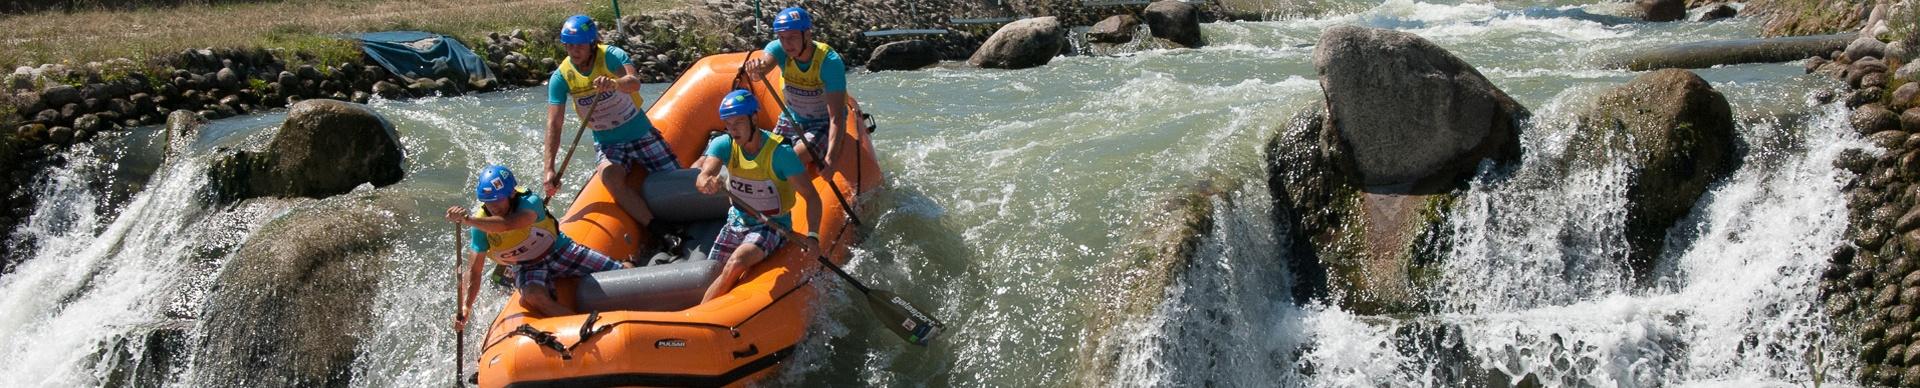 Bratislava Rafting